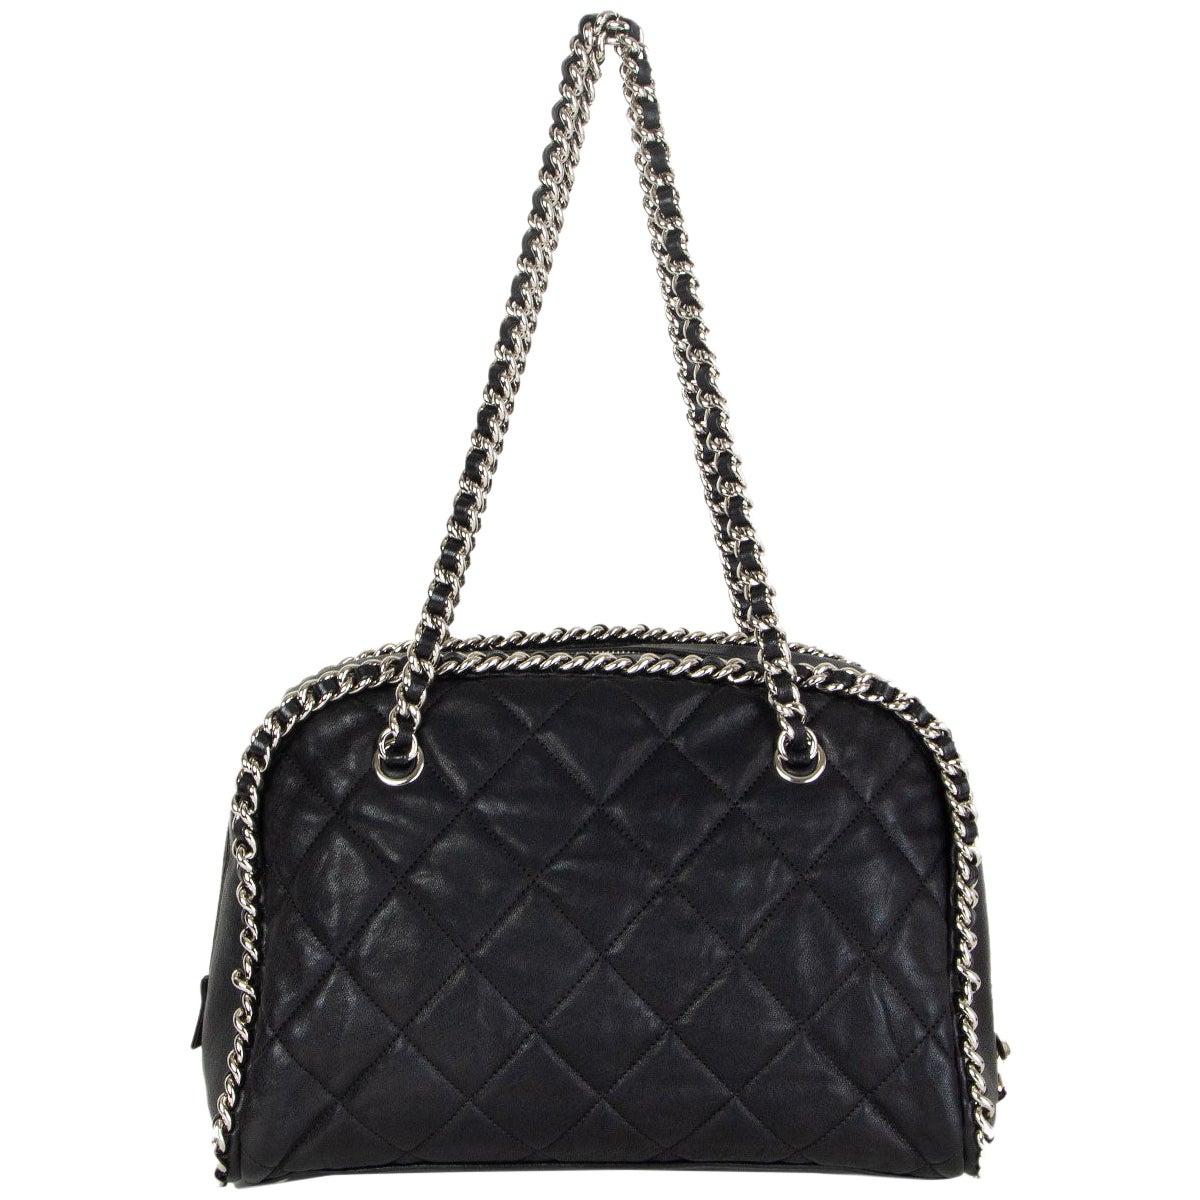 CHANEL black leather CHAIN AROUND BOWLER Shoulder Bag